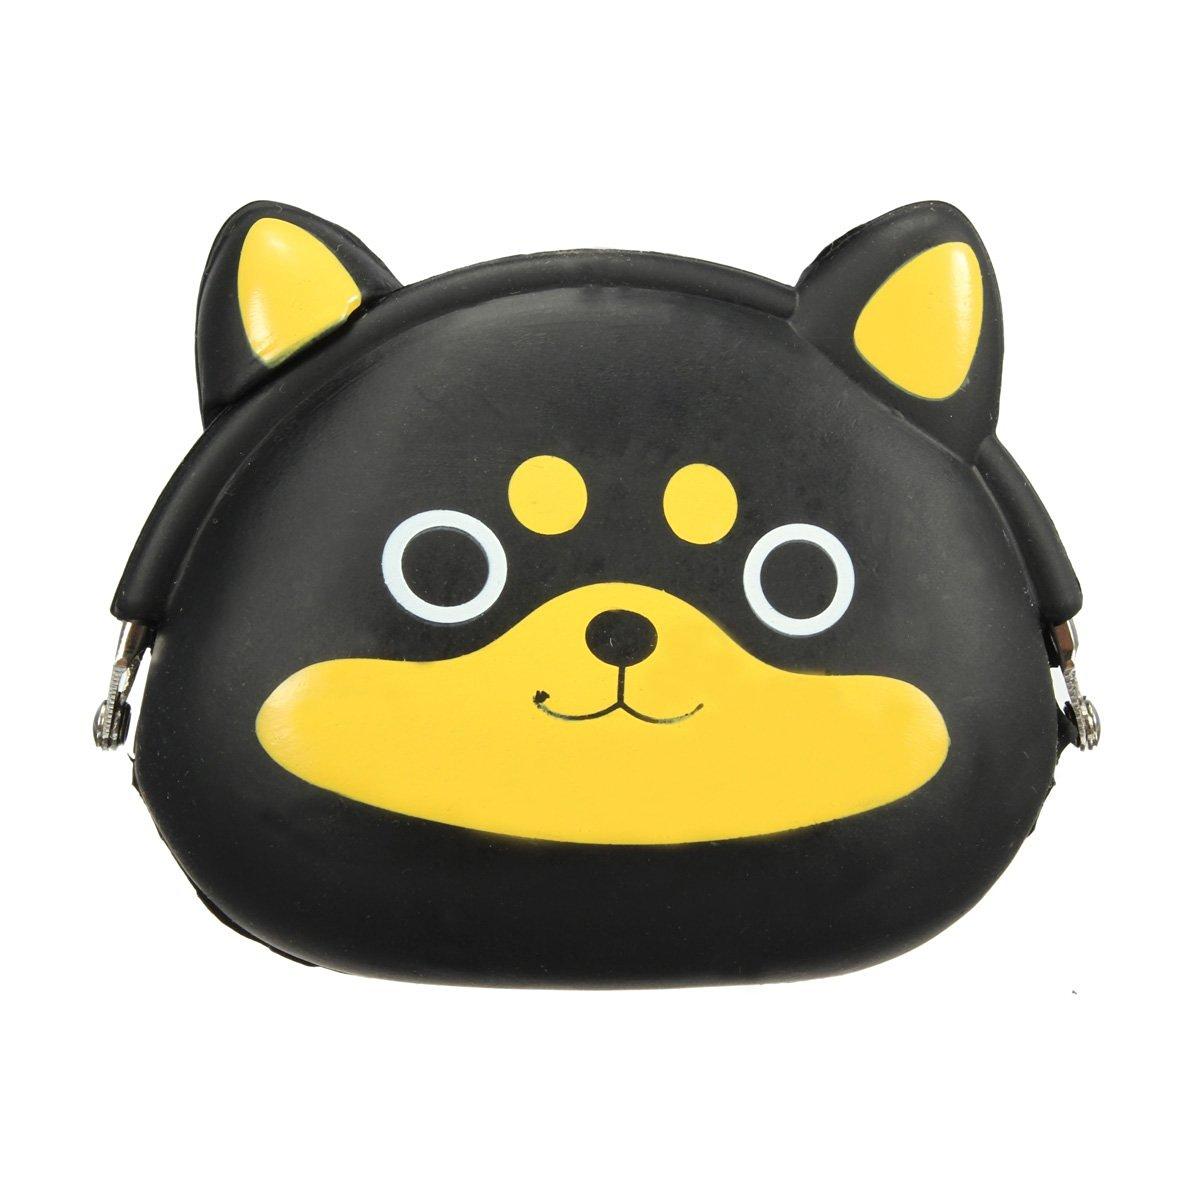 AFBC-Women Girls Wallet Kawaii Cute Cartoon Animal Silicone Jelly Coin Bag Purse Kids Gift Huskies